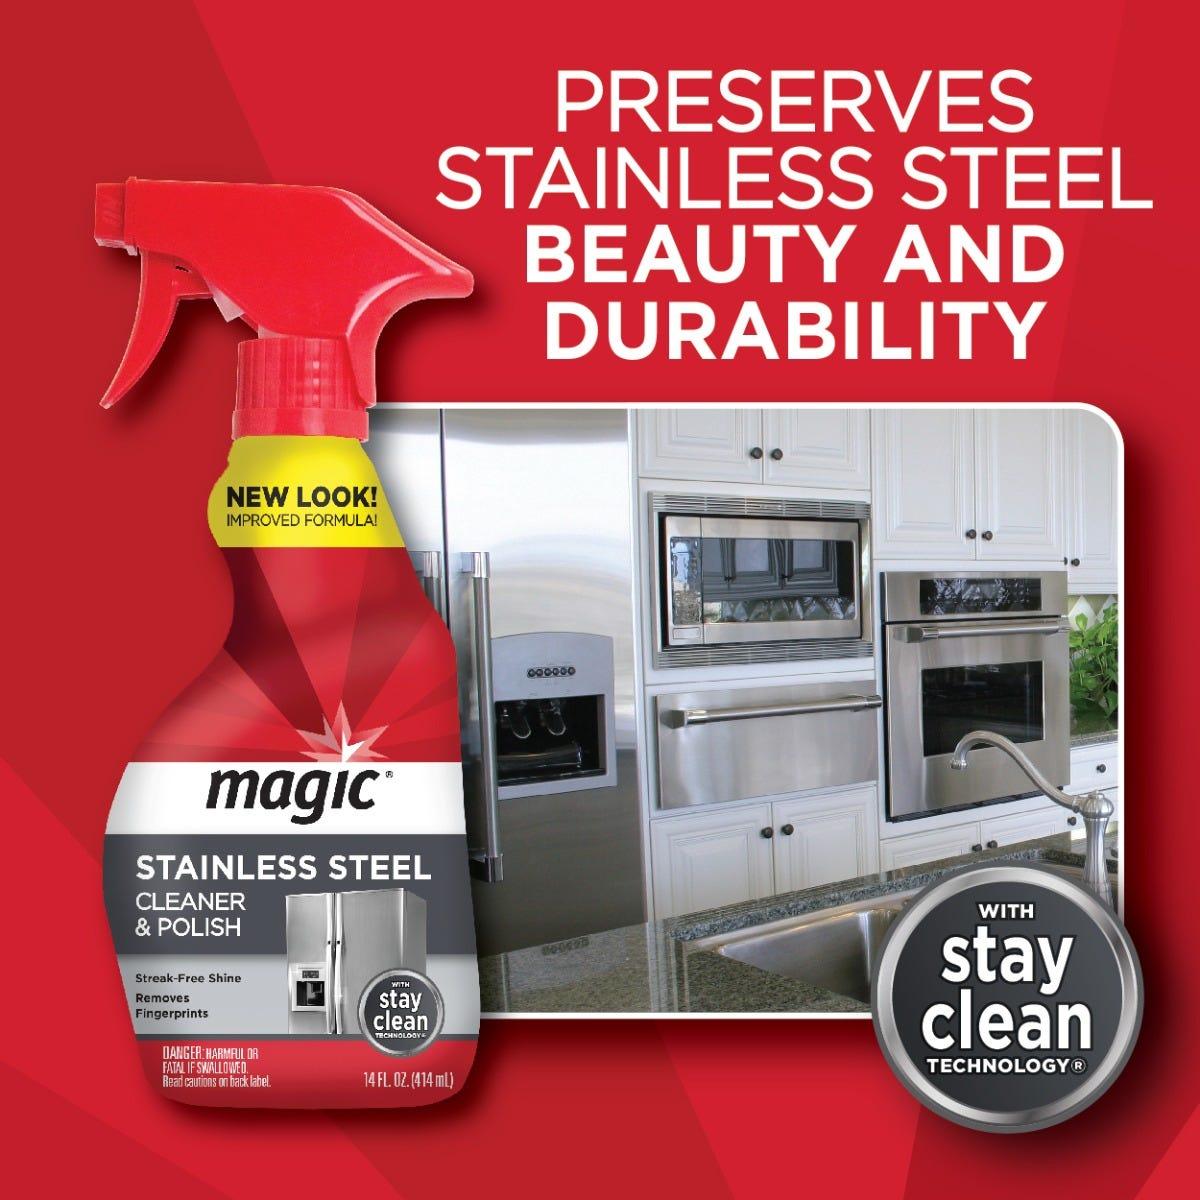 https://googone.com/media/catalog/product/m/a/magic_stainless_steel_cleaner_spray_beauty_2.jpg